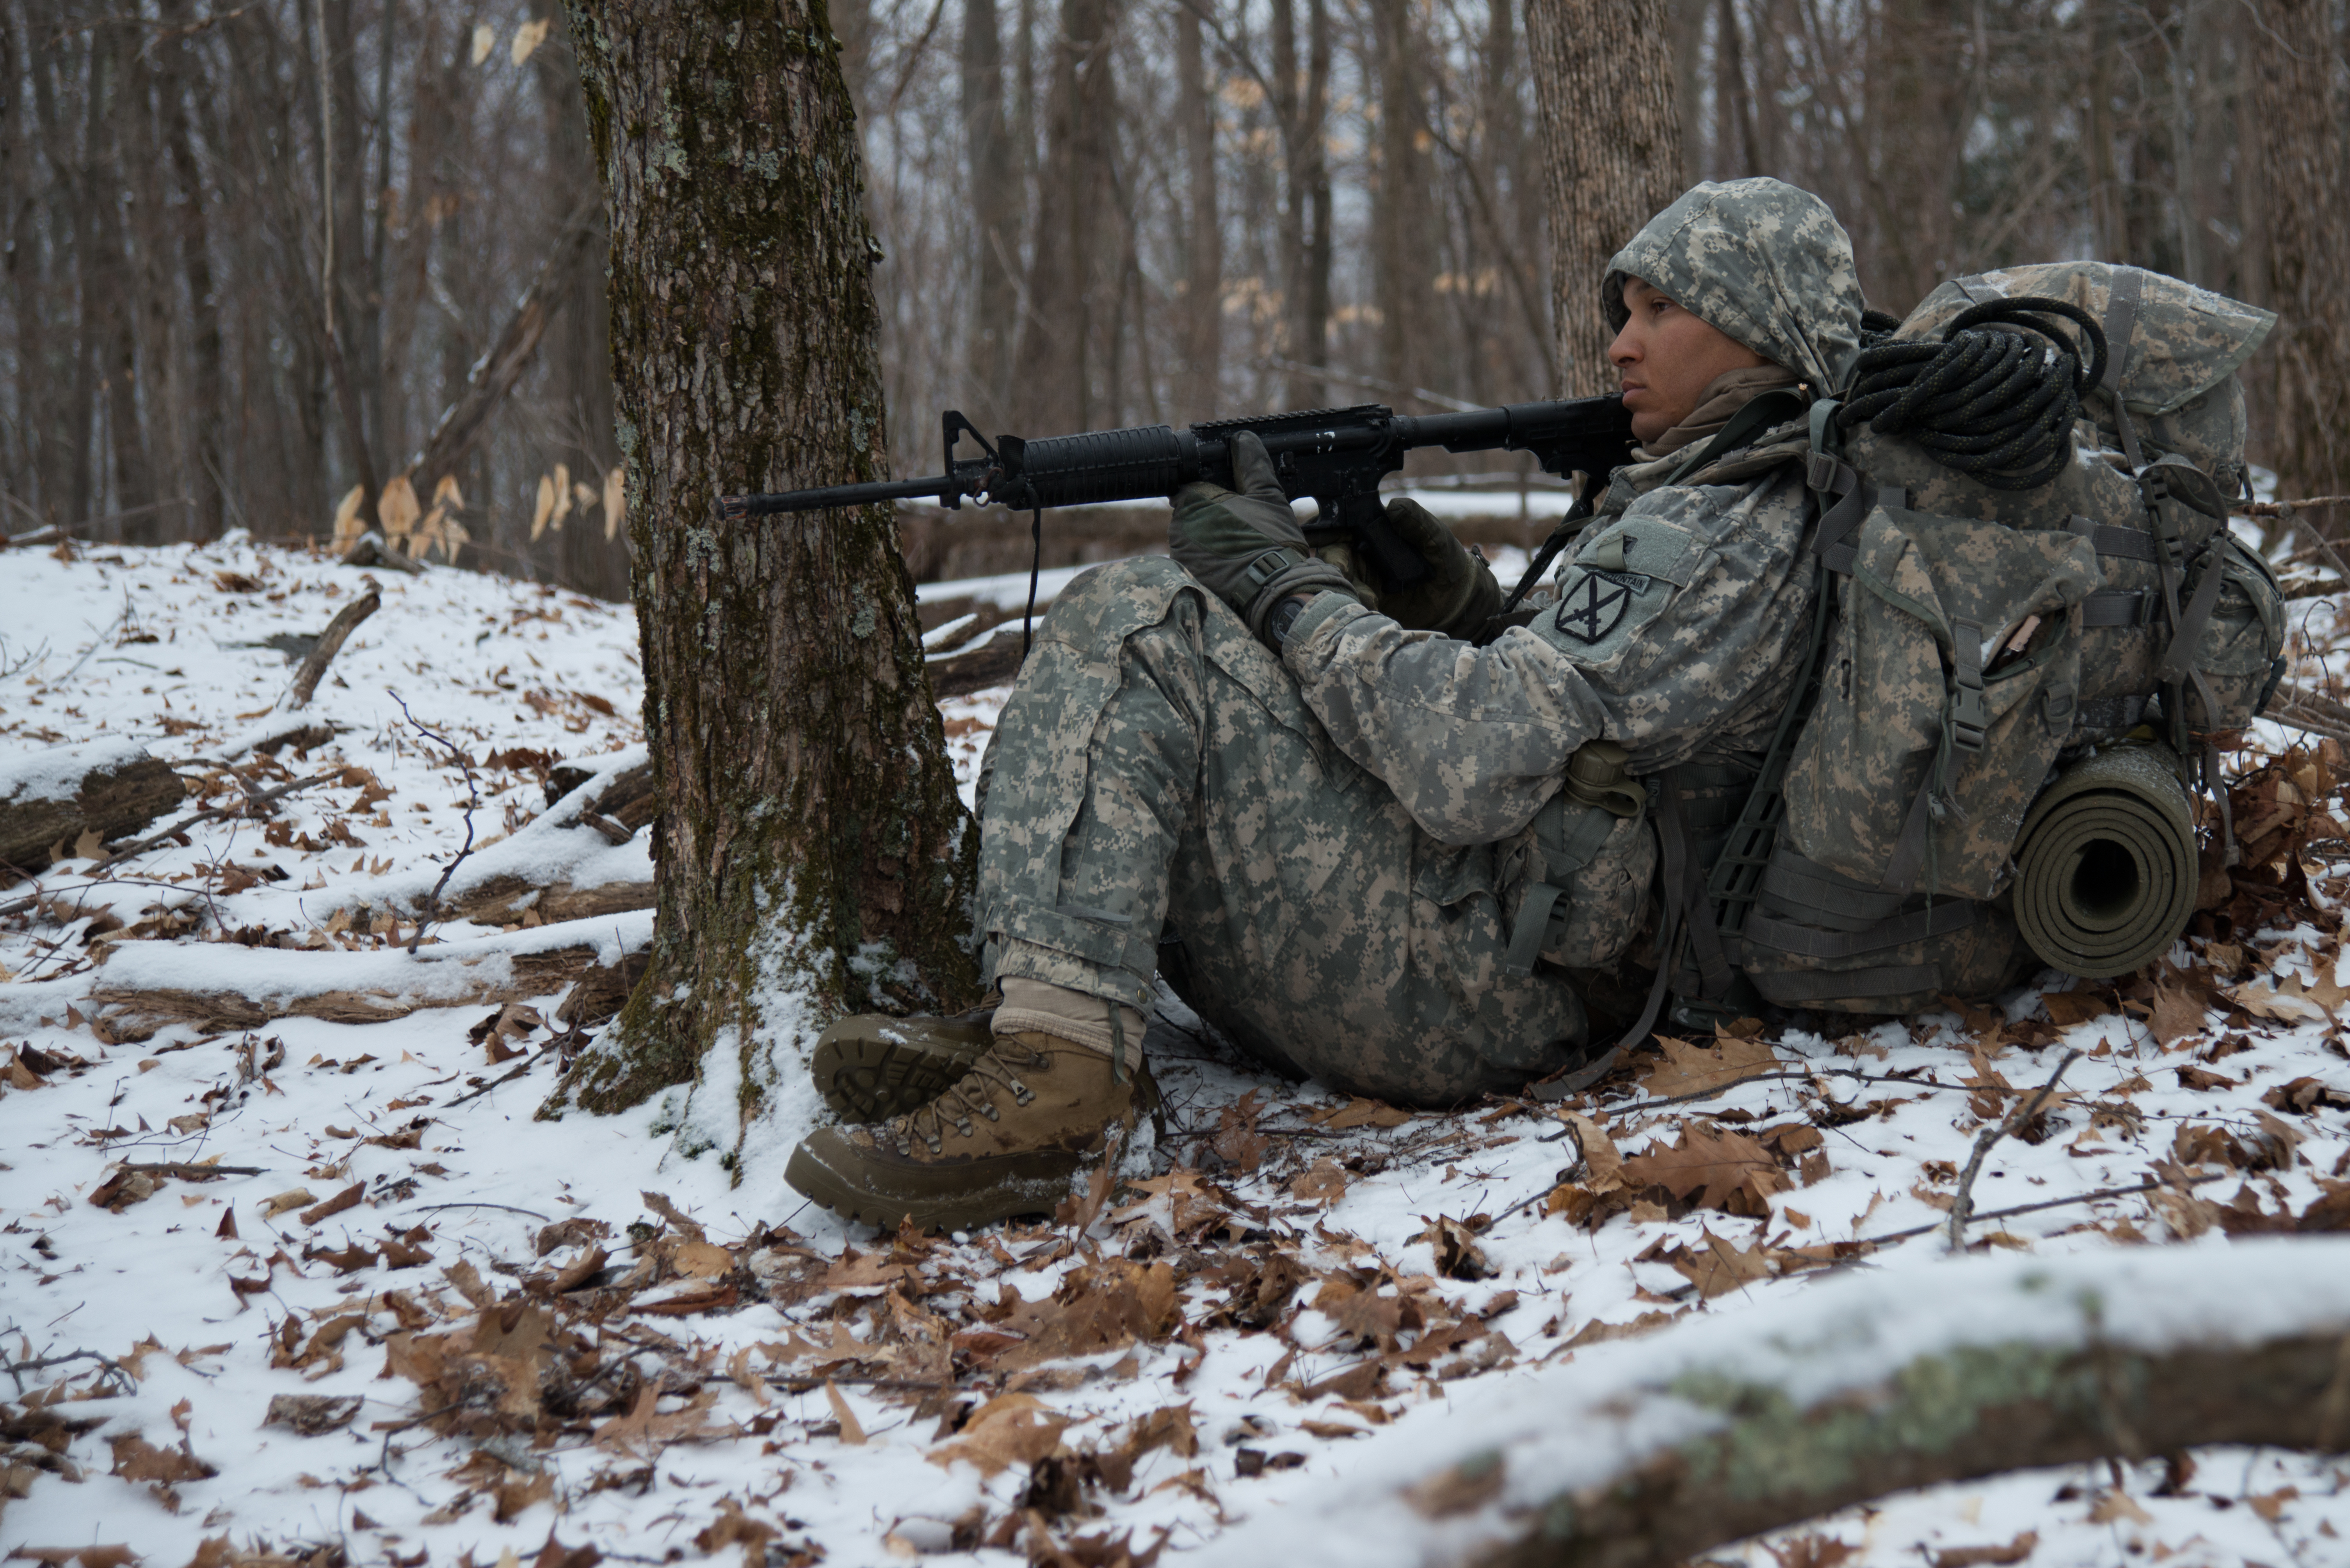 File:Army Mountain Warfare School winter exercises 160324-Z-QK503-042.